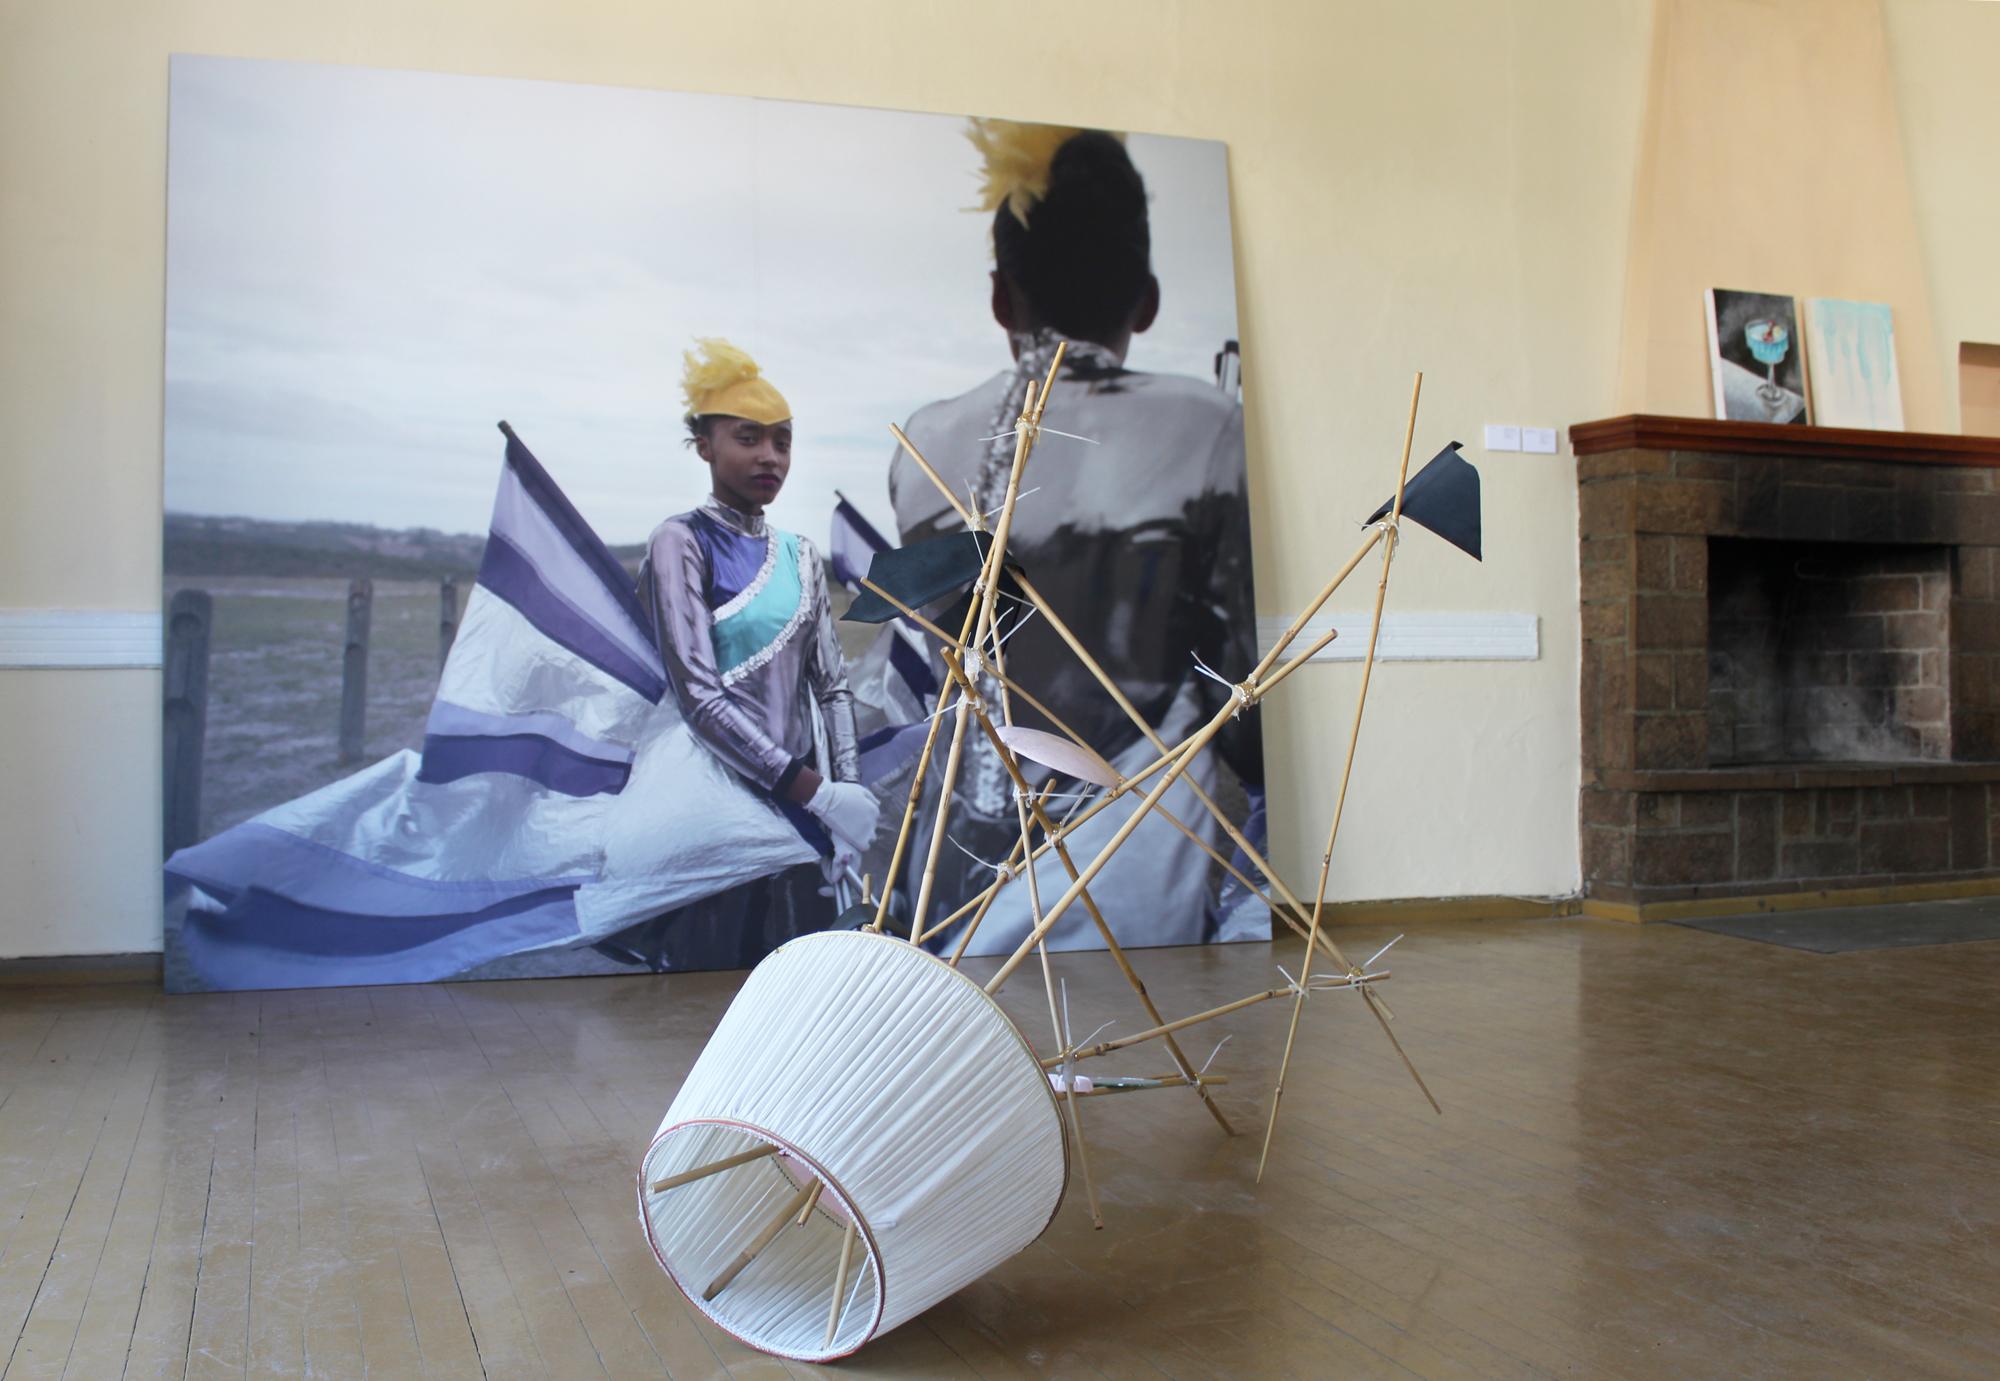 2_Installation View, How to Fall with Grace, Alice Mann, Nana Sachini, Jacopo Miliani and Antonietta F. Miliani.jpg